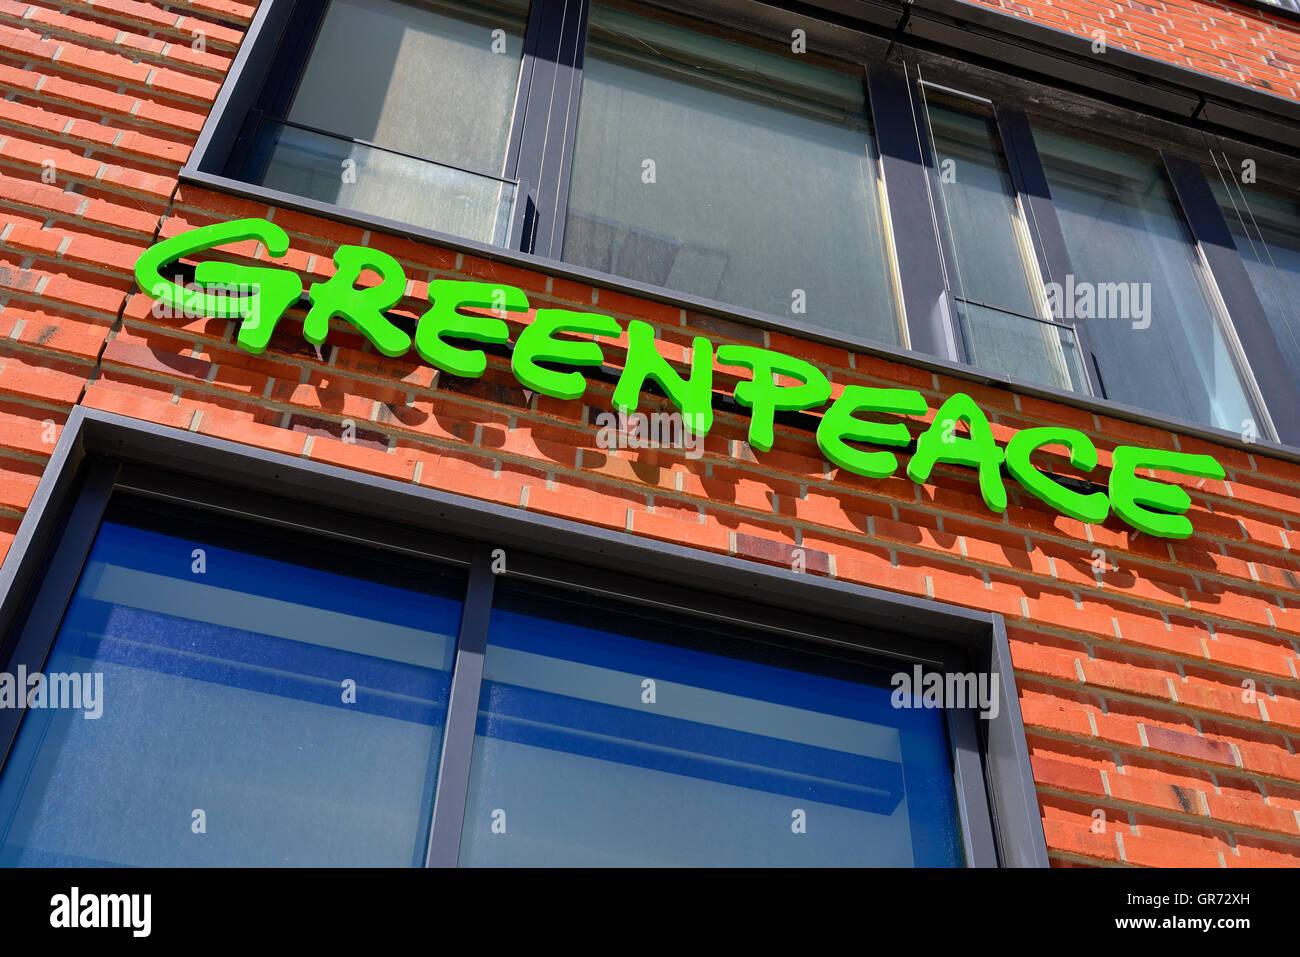 German Head Office Of Greenpeace In Hamburg, Germany - Stock Image